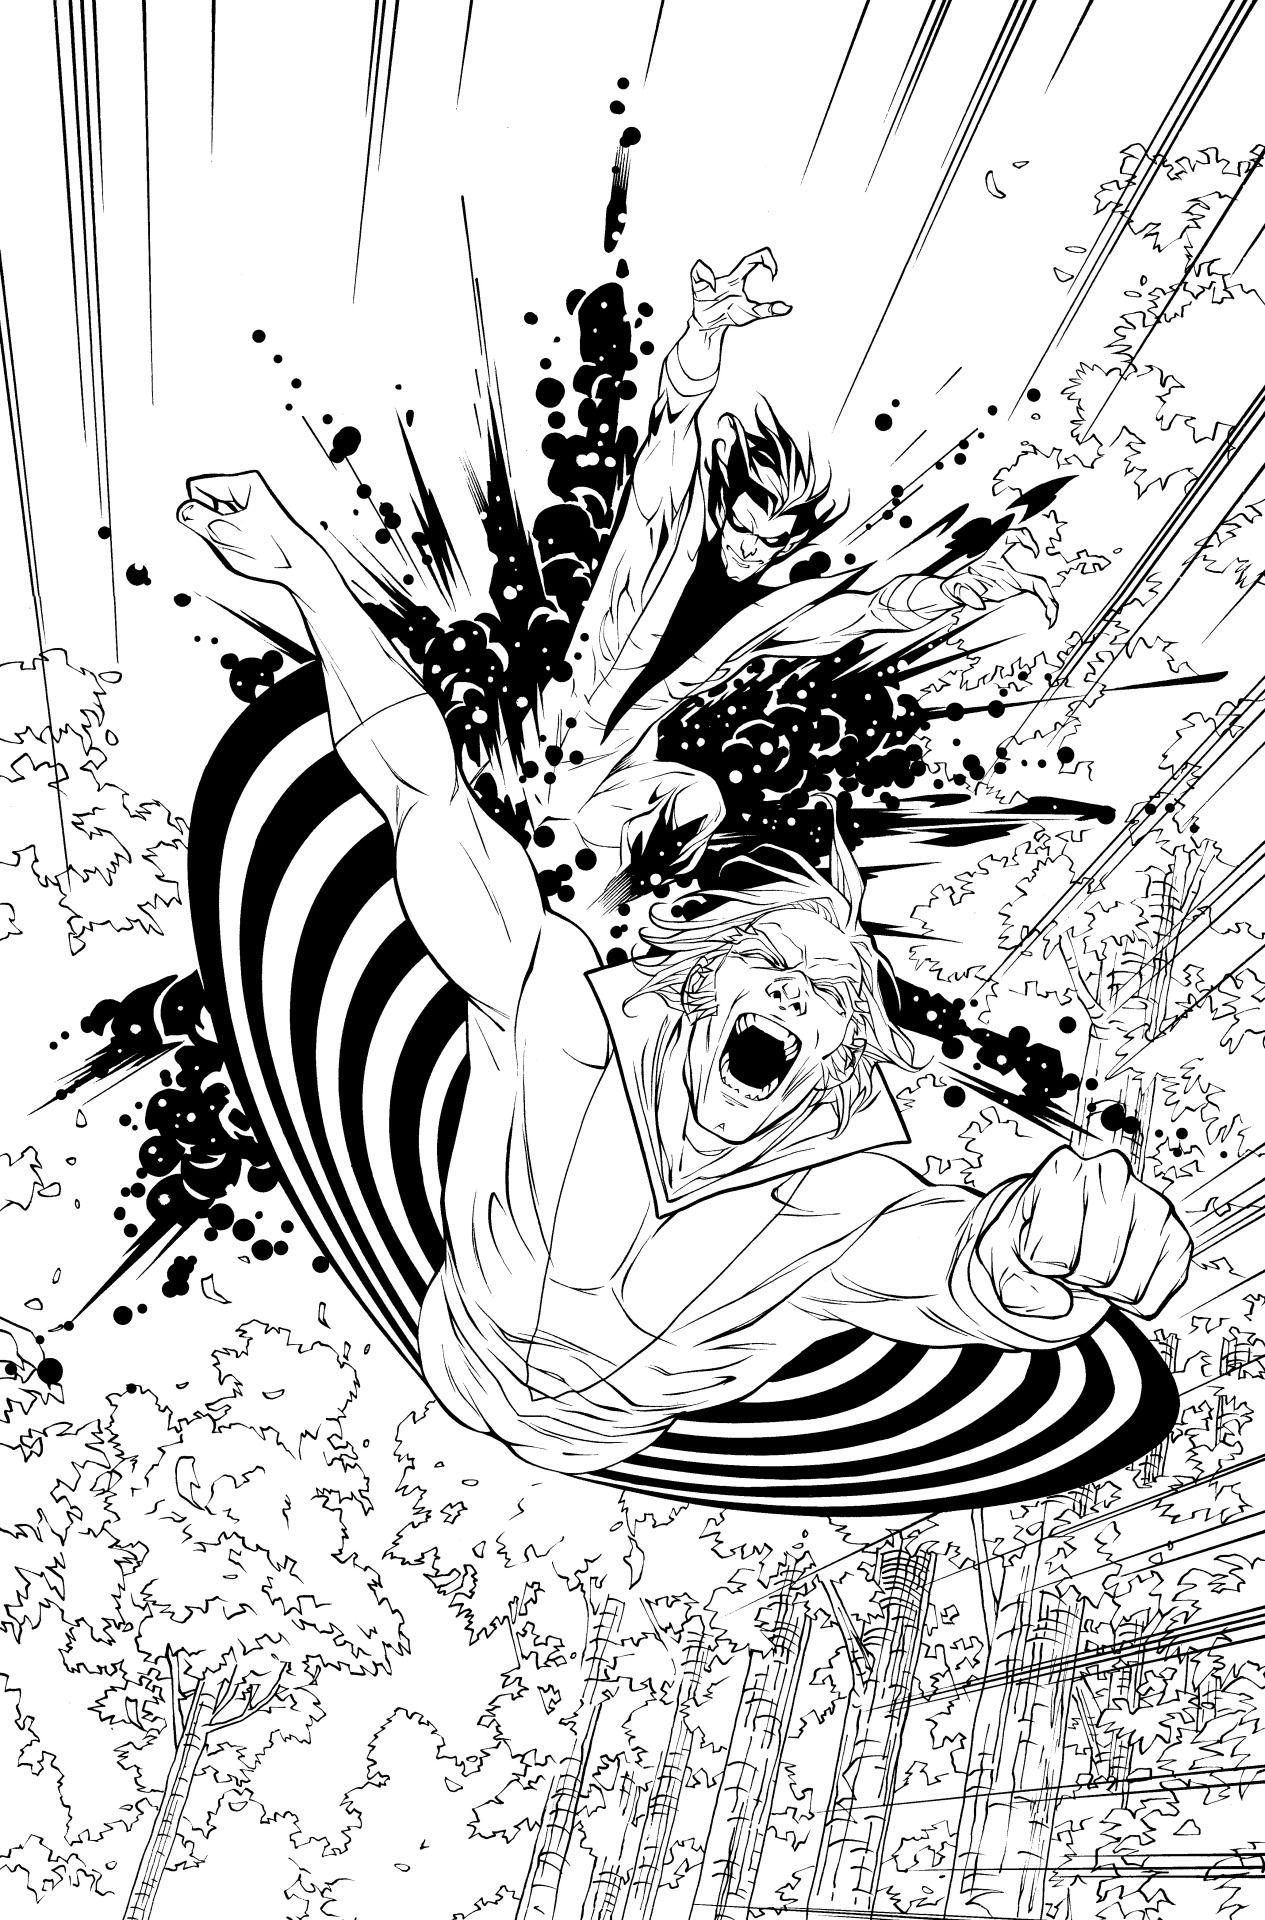 Mutant Marvel Proud Uncanny X Men First Class 3 Page 1 By Roger X Men Nightcrawler Marvel Art